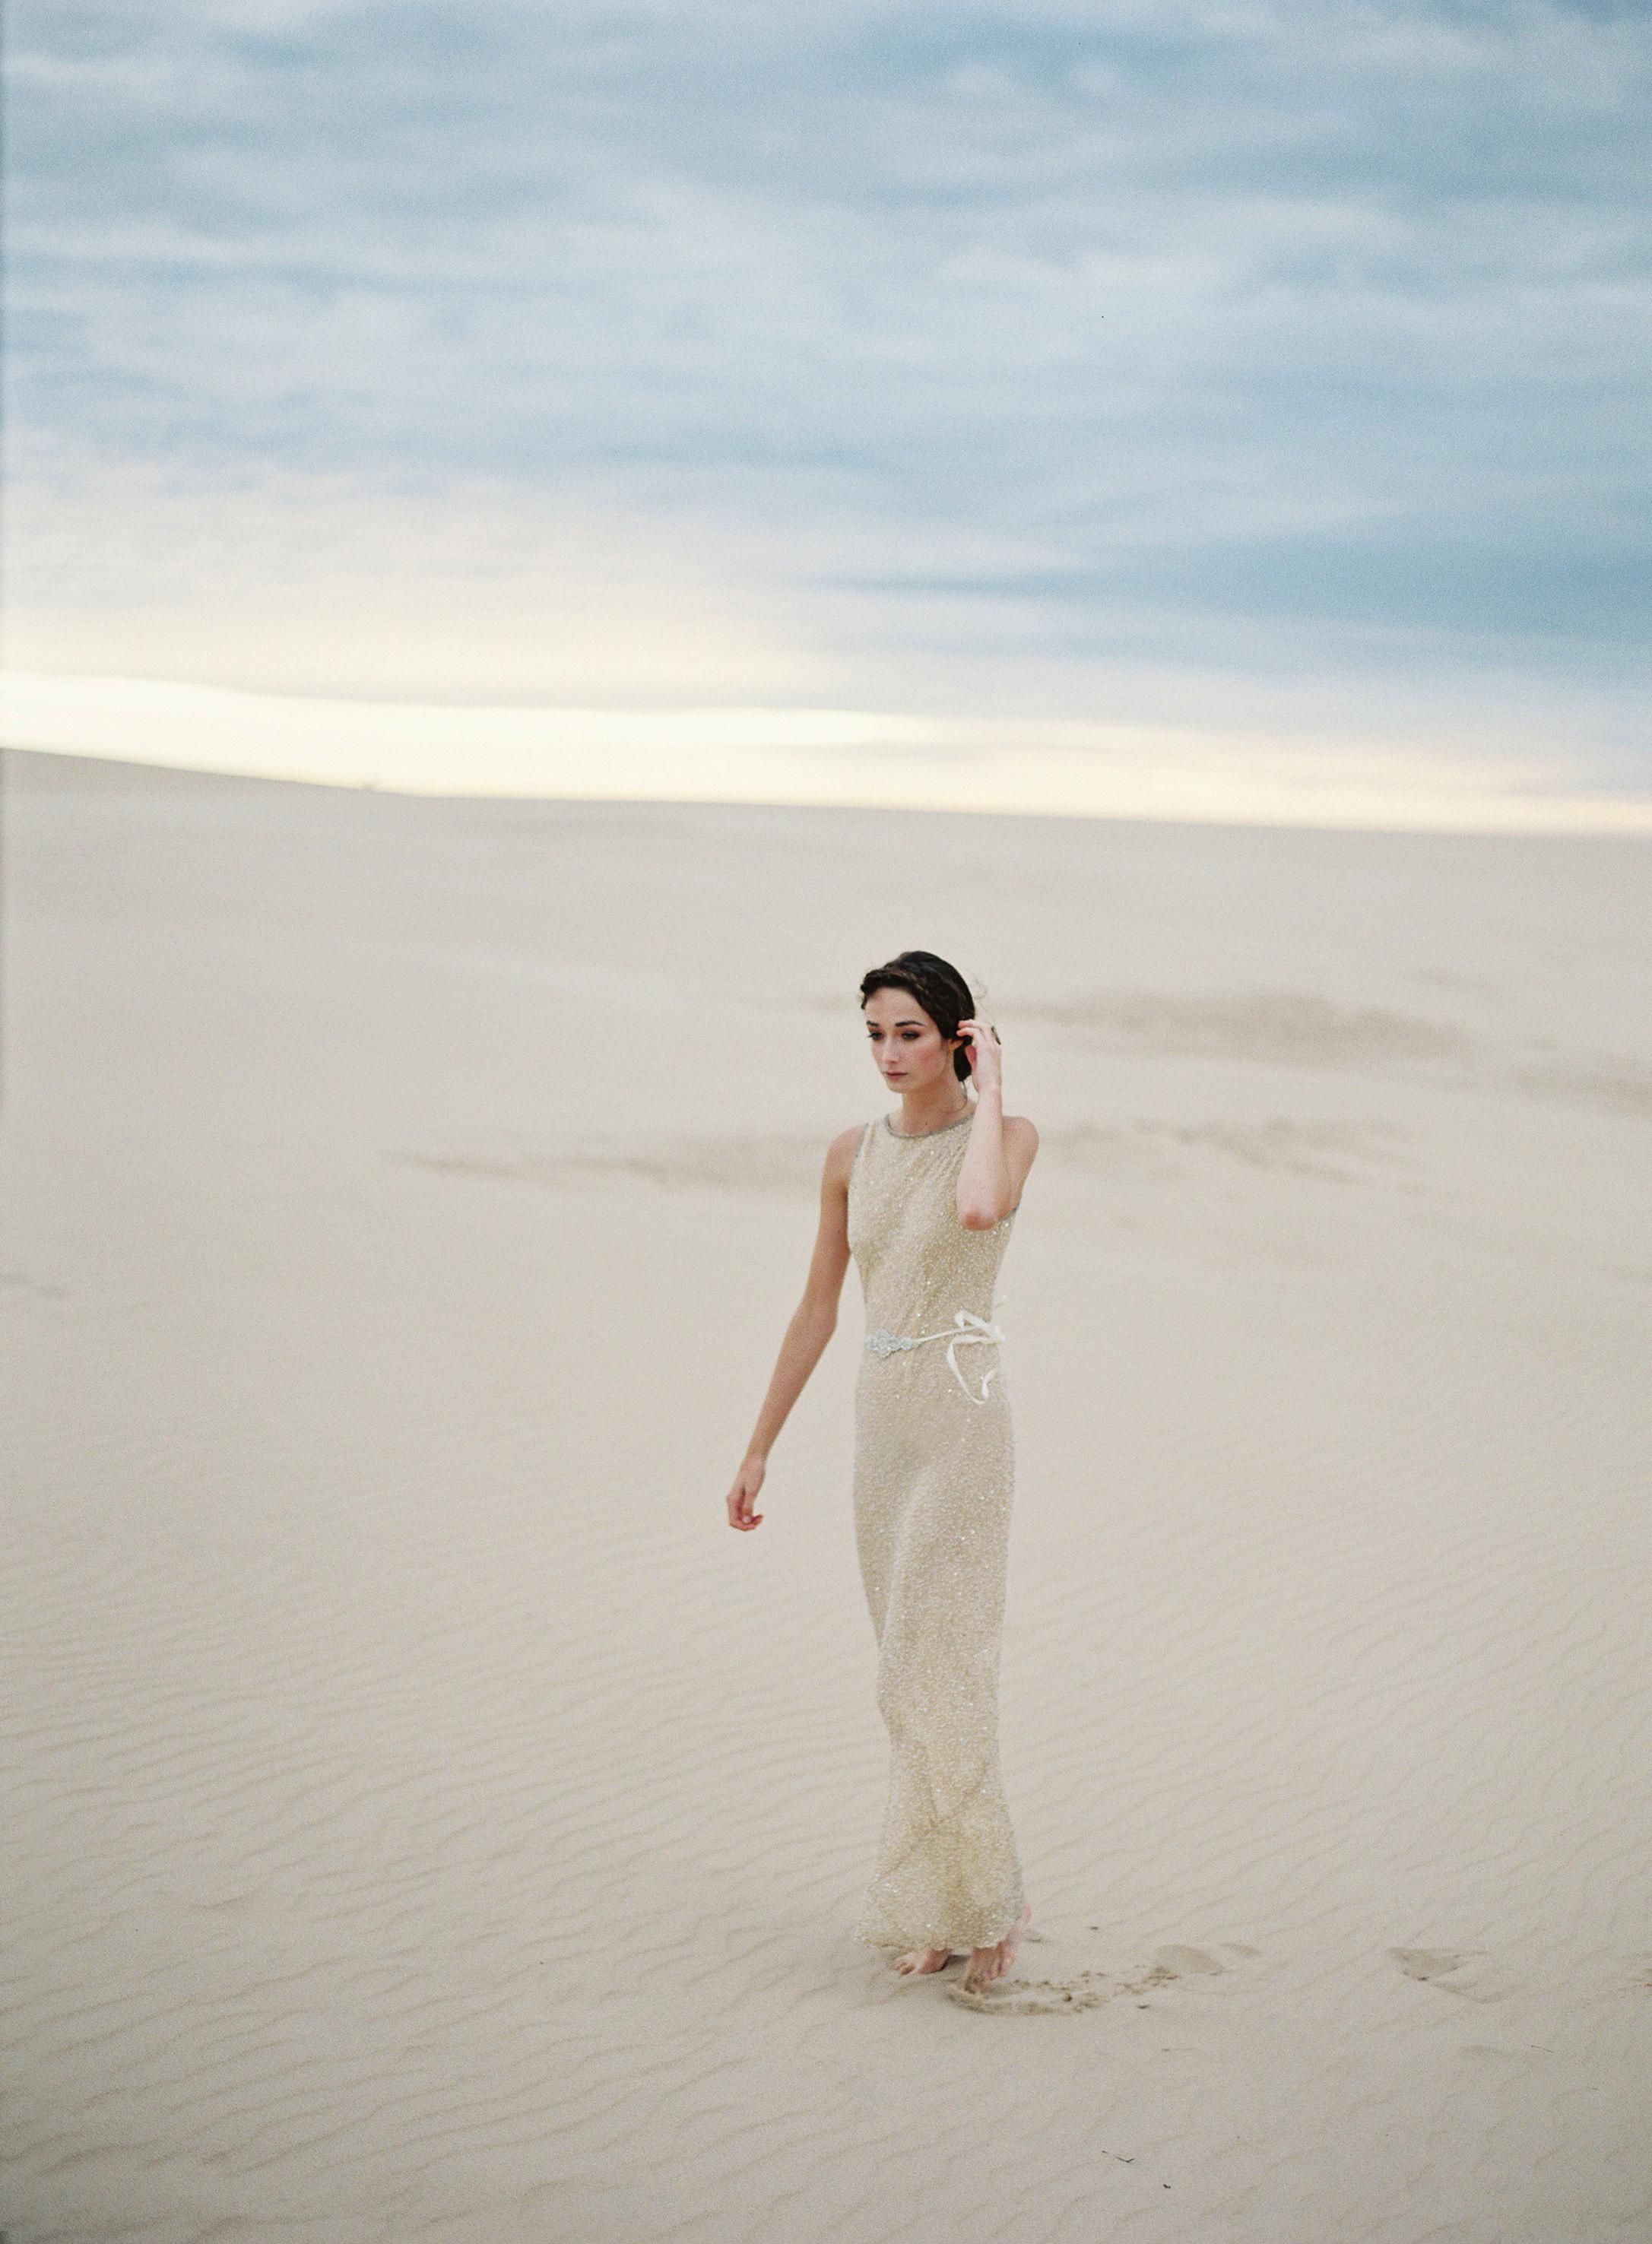 Kyle John l Fine Art Wedding Photography l Chicago, Copenhagen, California, New York, Destination l Blog l Millicent_21